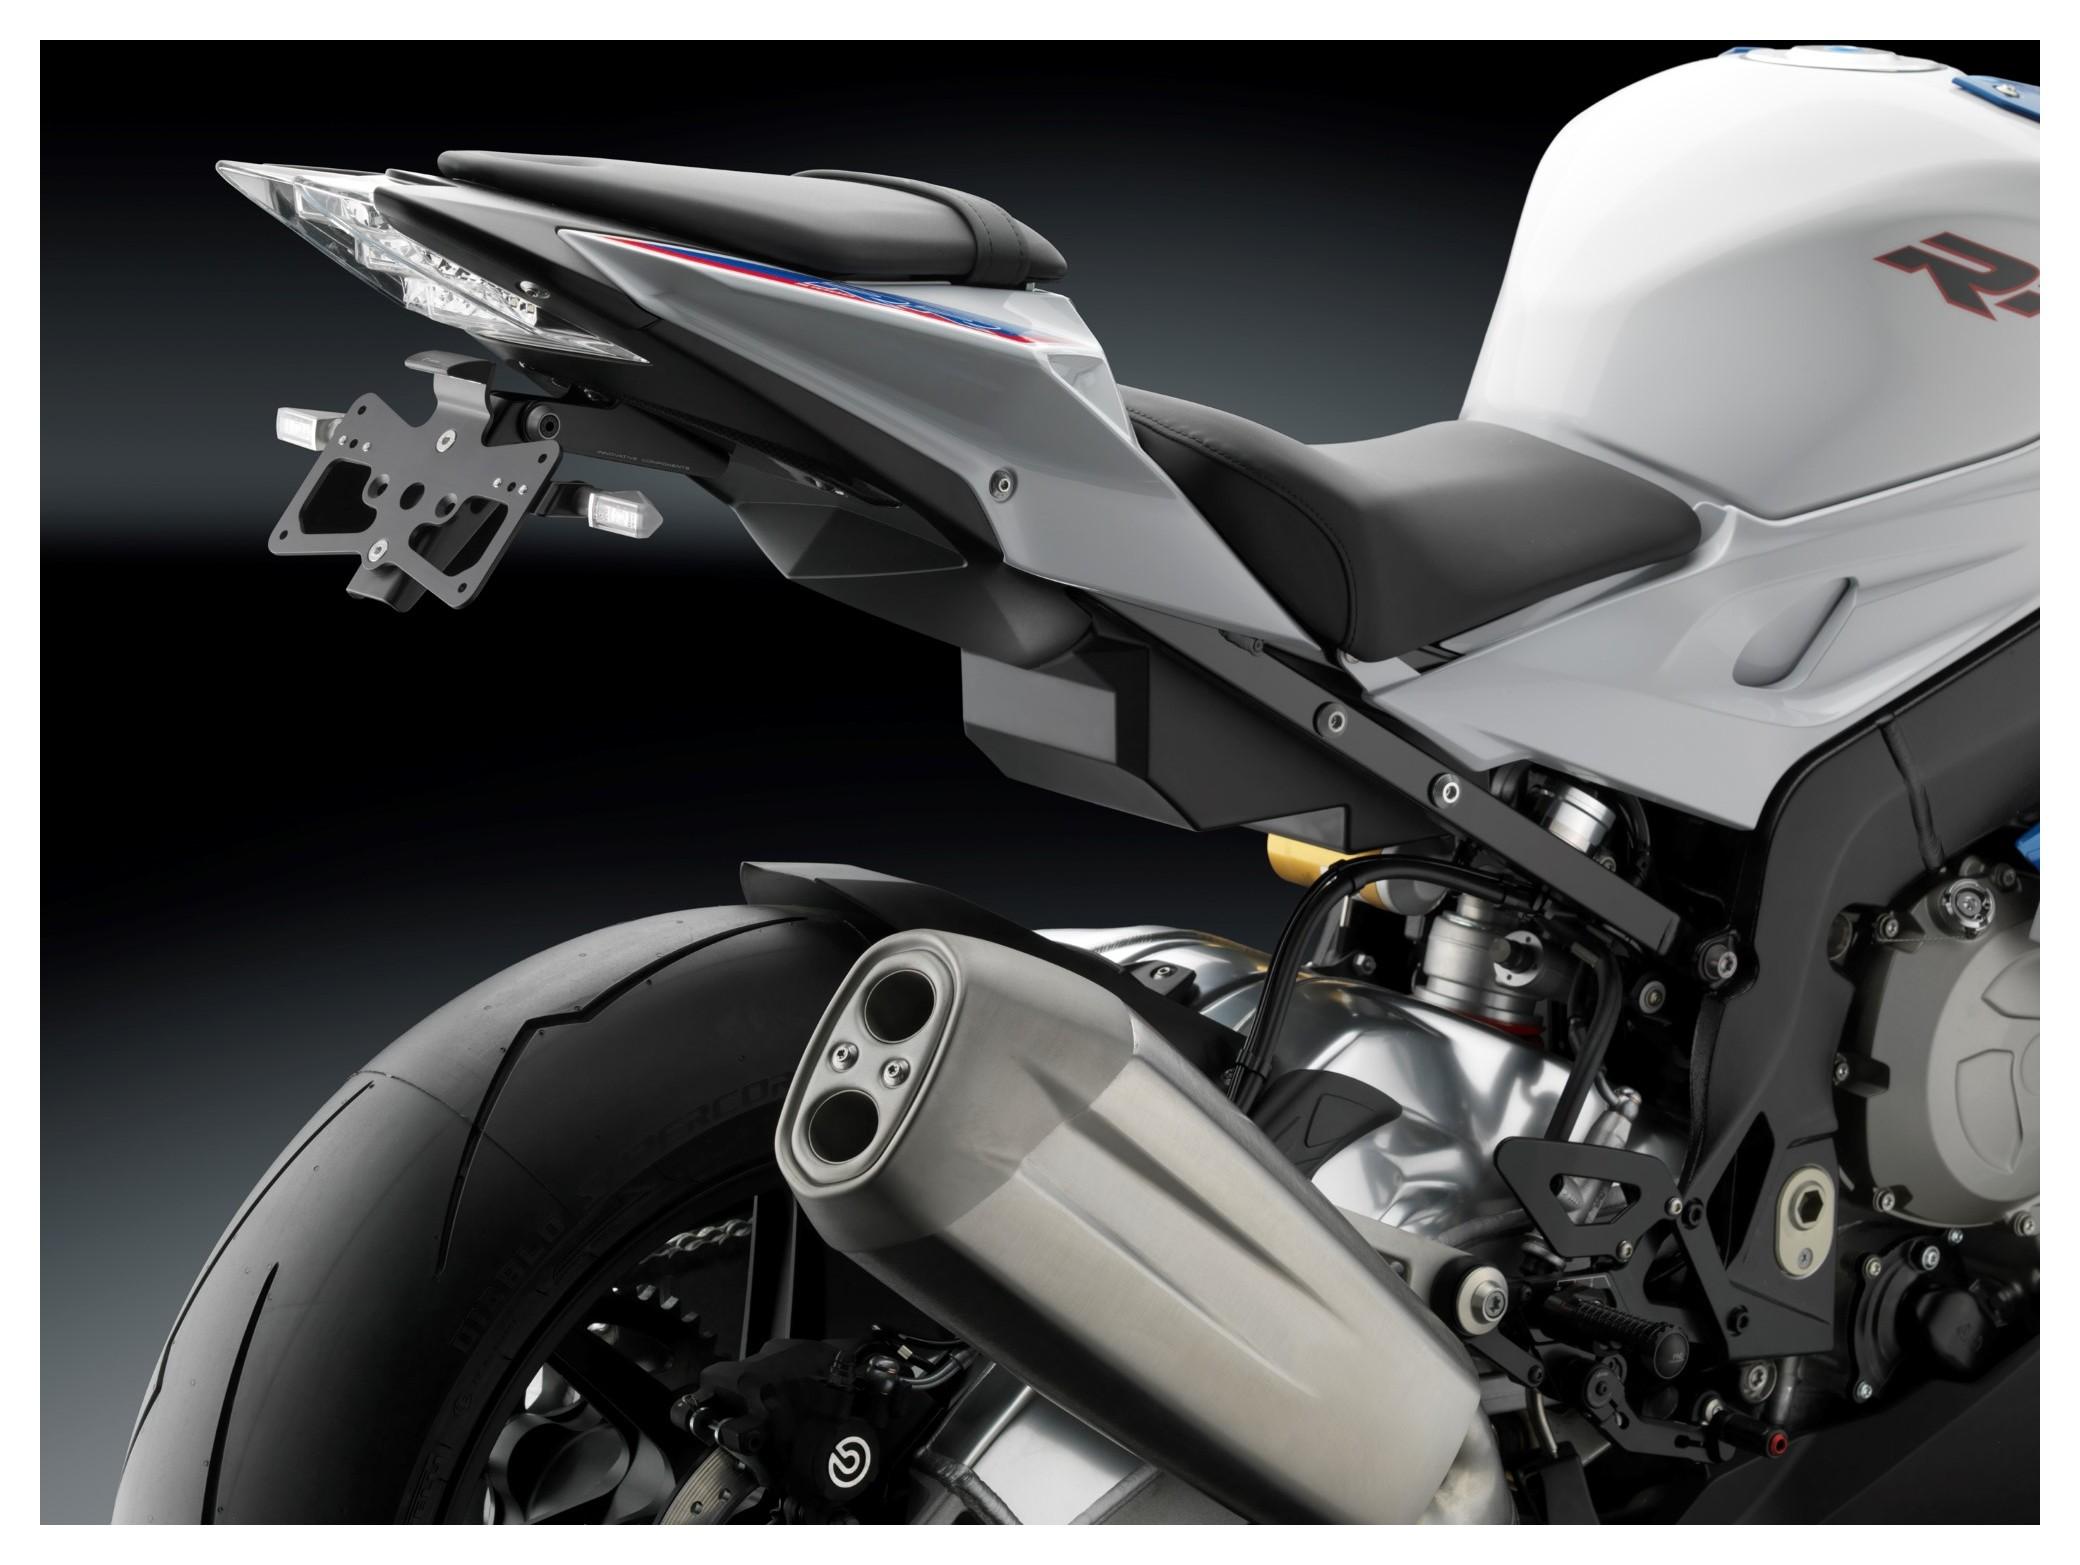 200x Fairing Body Bolts Kit Screws Clip For BMW S1000RR 2010-2015 S1000 RR